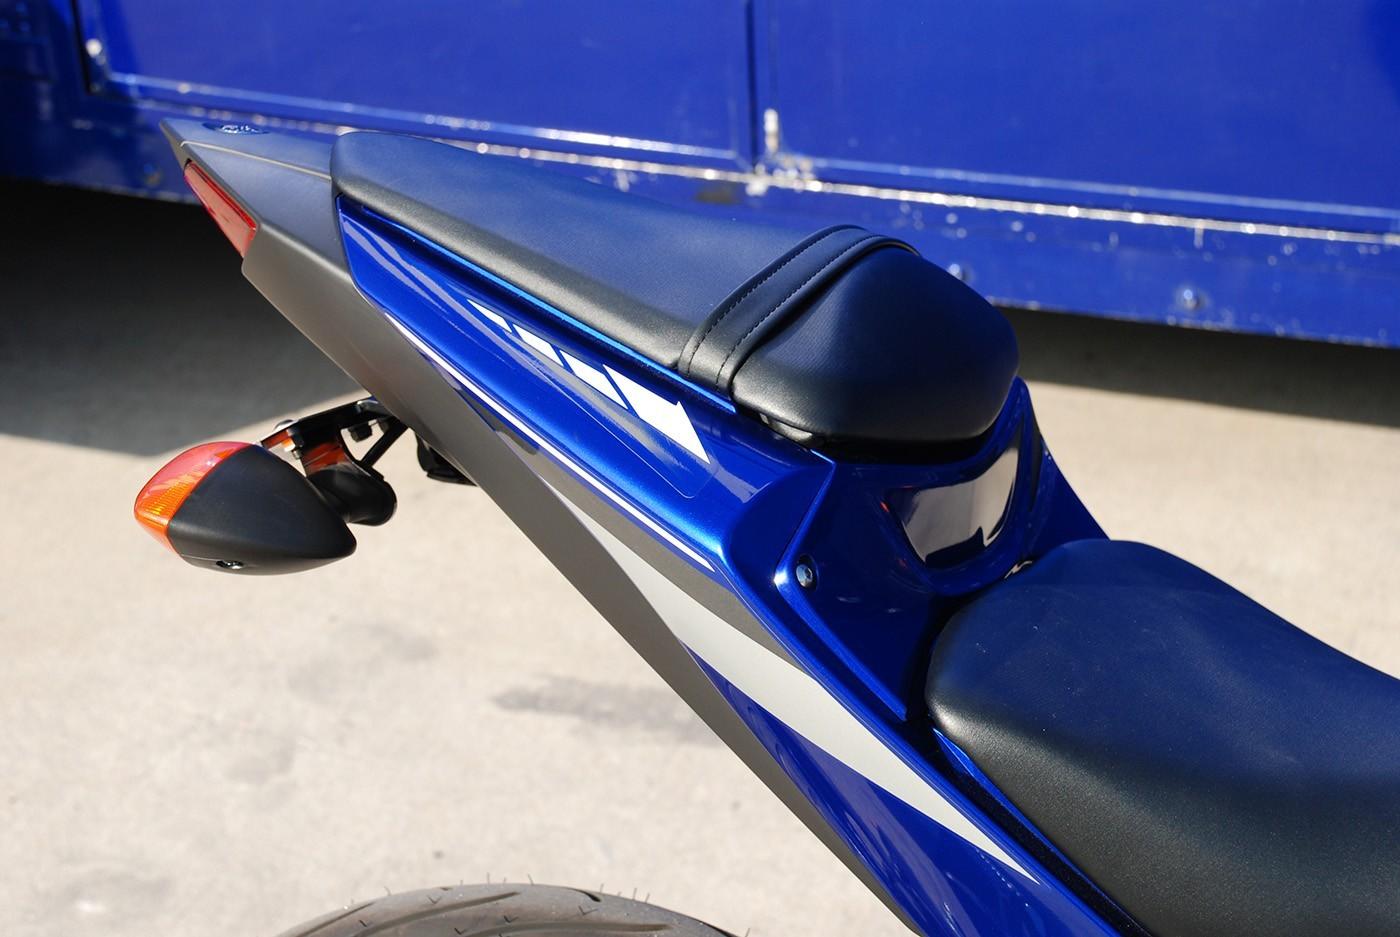 Graves Motorsports Yamaha YZF-R3 2015-2018 Fender Eliminator Kit